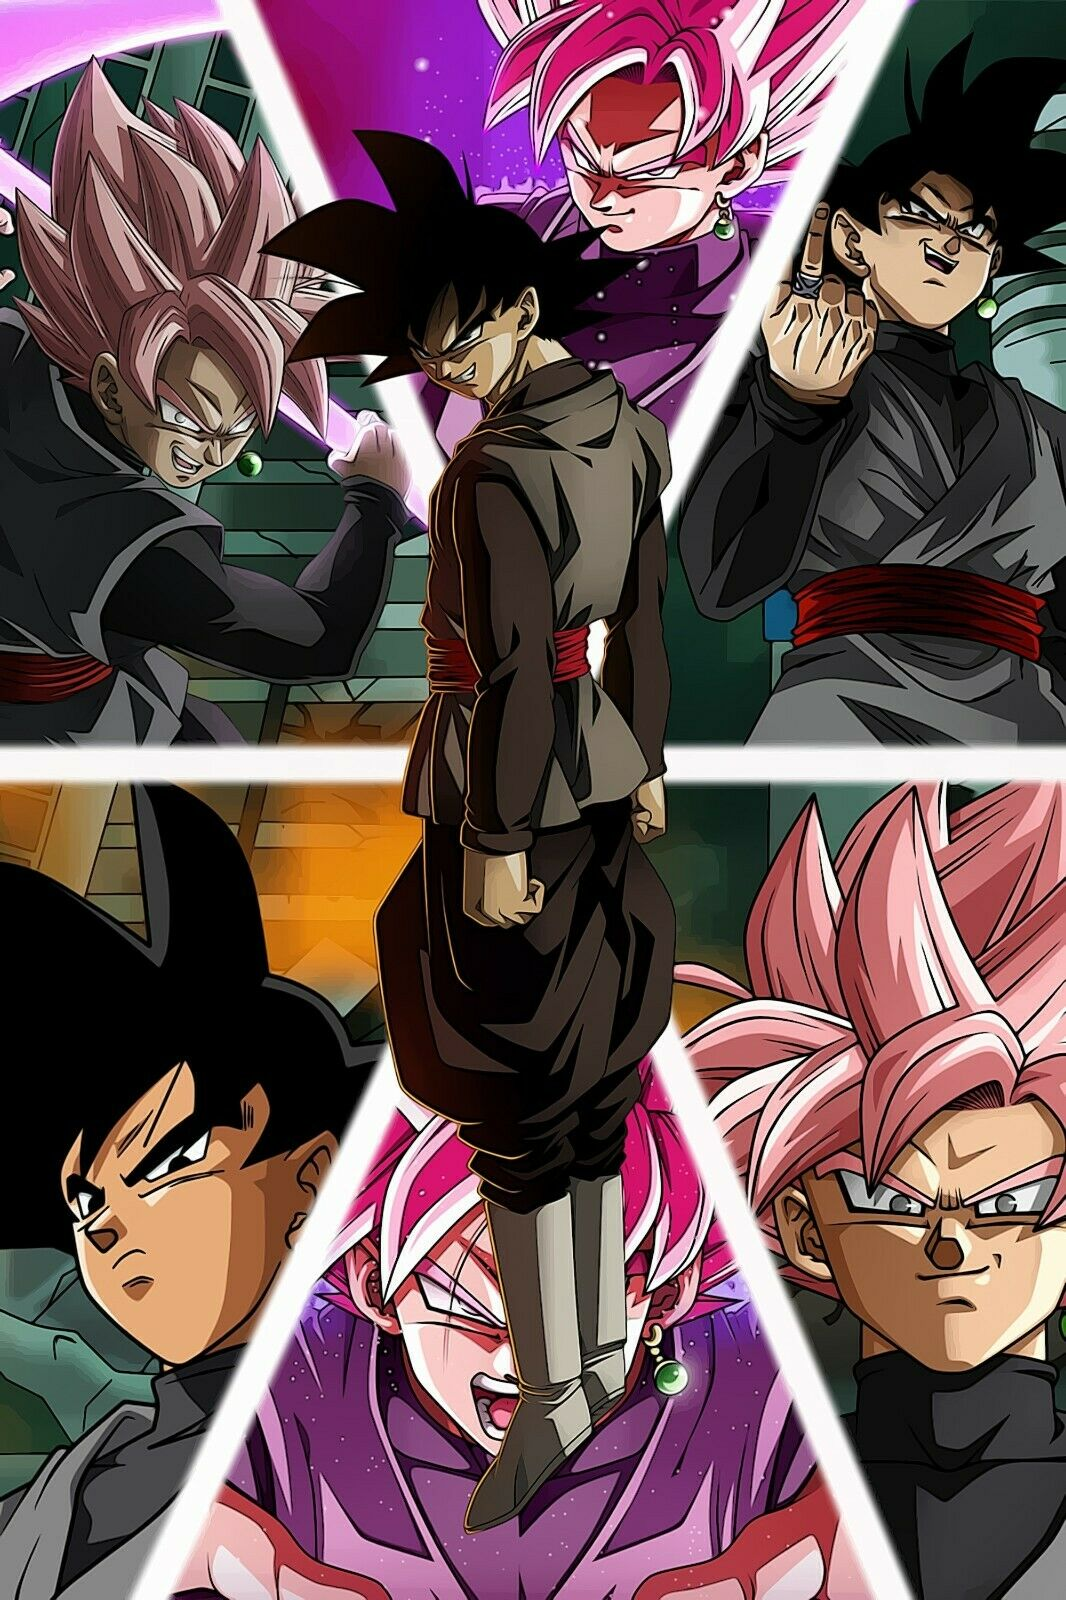 11x17 13x19 Dragon Ball Z Poster Super Saiyan Rose NEW Goku Black